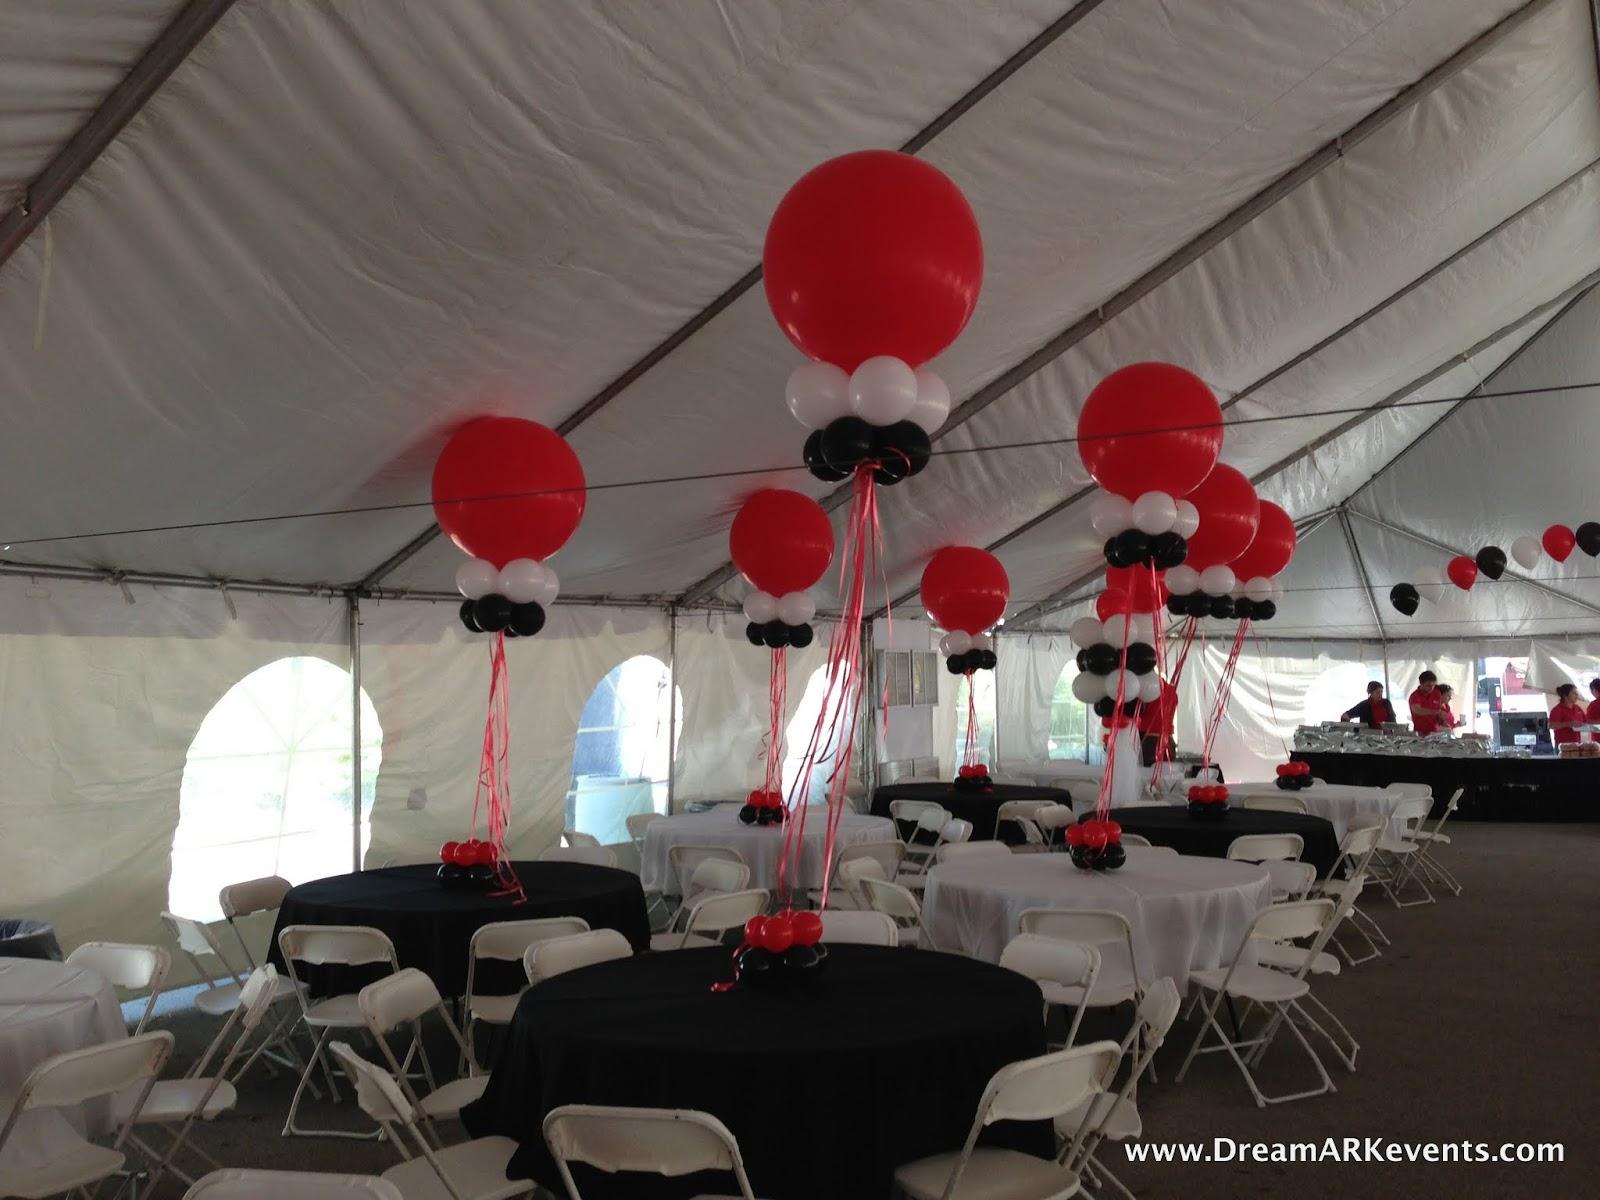 DreamARK Events Blog: Tent balloon decoration.